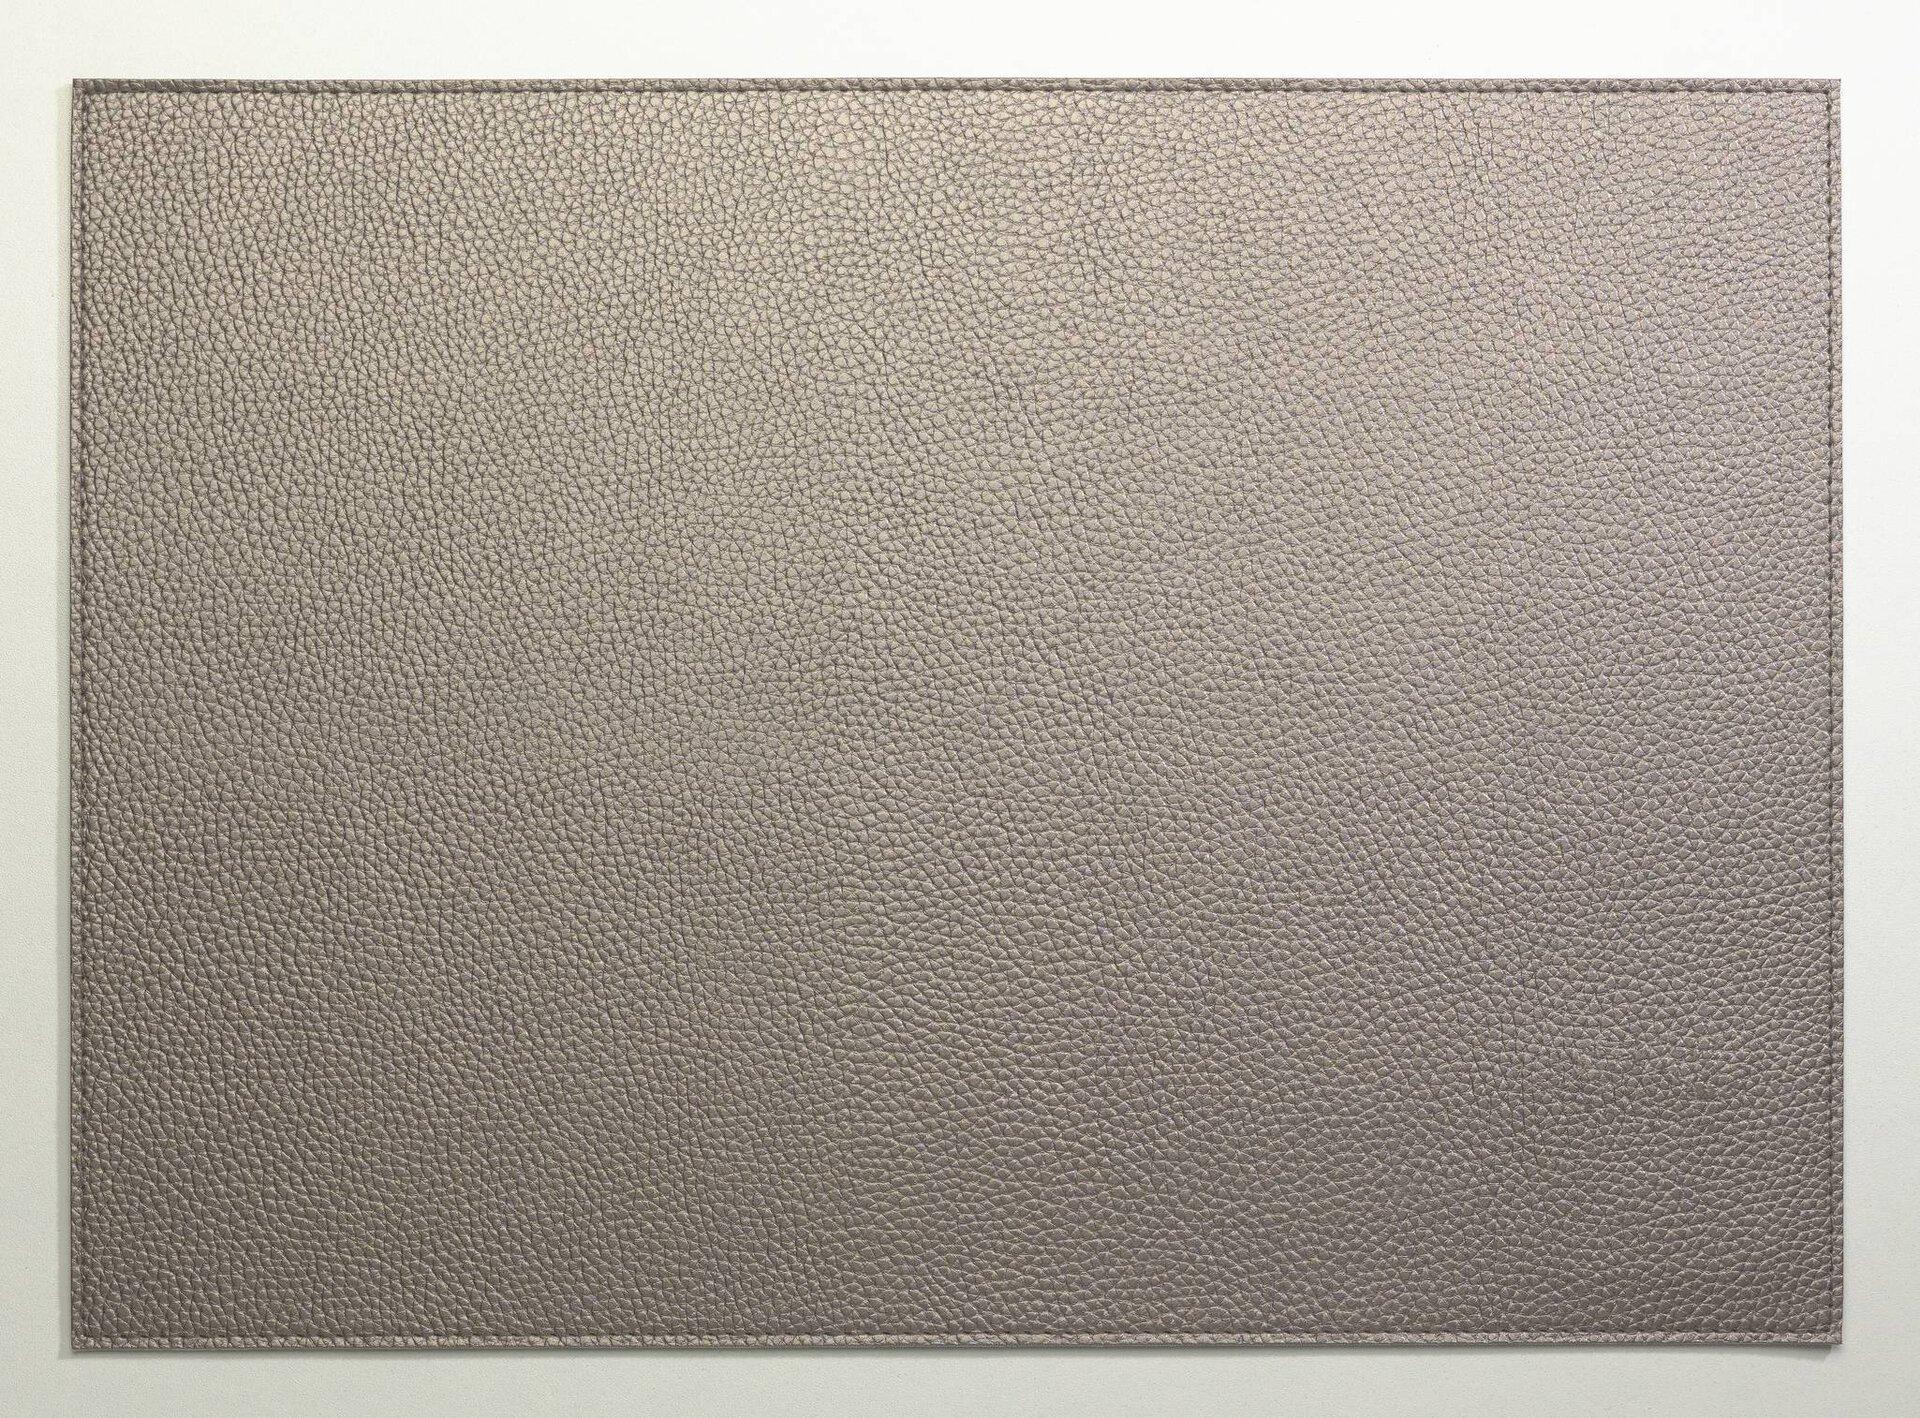 Tischset 174183 Casa Nova Casa Nova Kunststoff 33 x 46 x